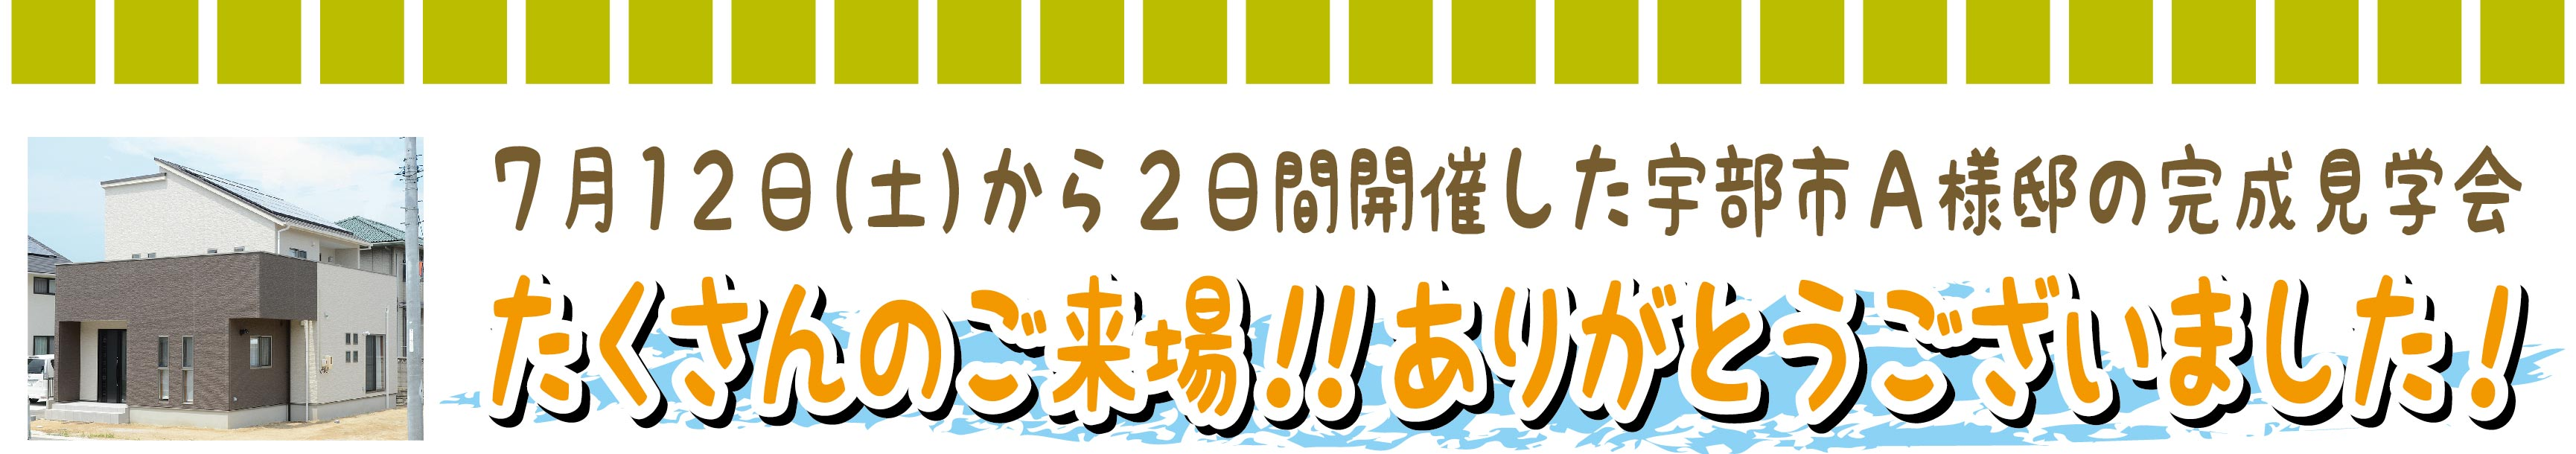 KuraSi-natu-sin86-09.jpg